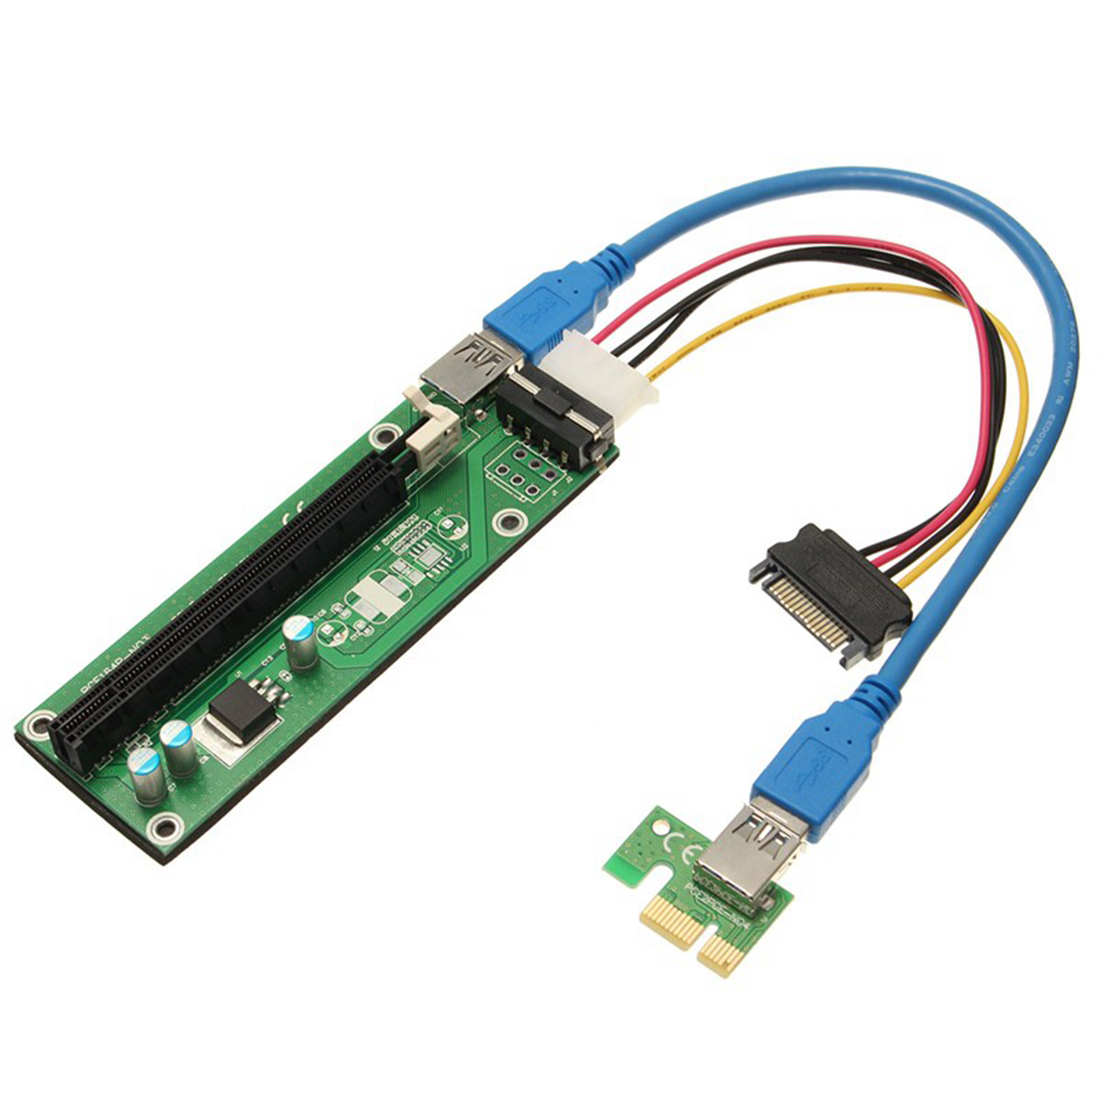 PCI Express PCI-E 1x-16x Extender Riser Card USB 3.0 + SATA 15P Cable Adapter pci